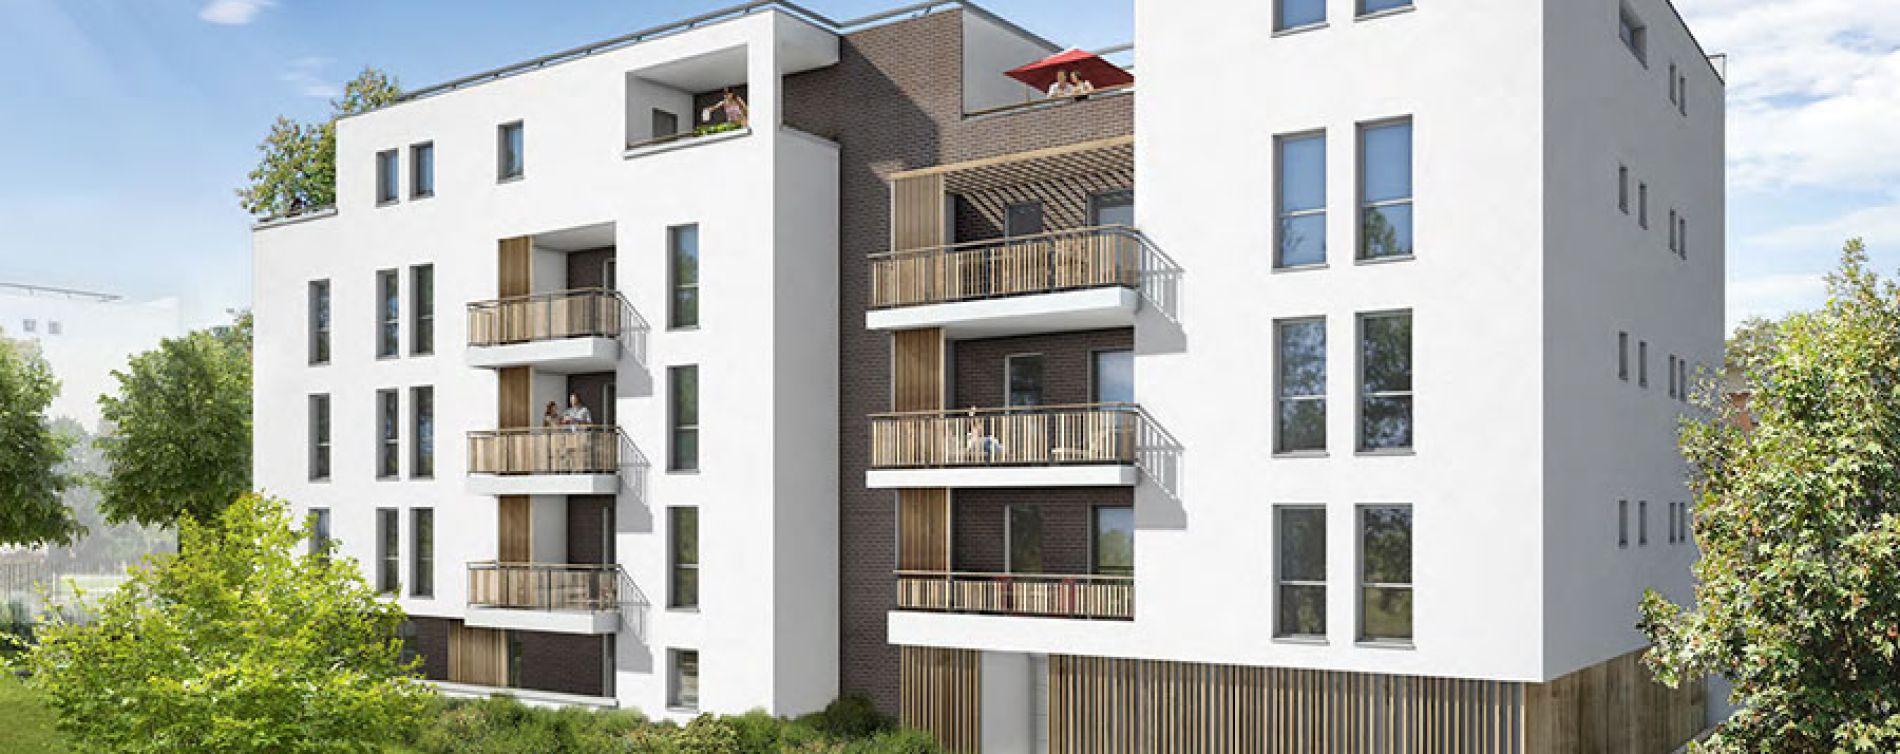 les essentielles b timents 3 4 colomiers programme immobilier neuf n 210465. Black Bedroom Furniture Sets. Home Design Ideas